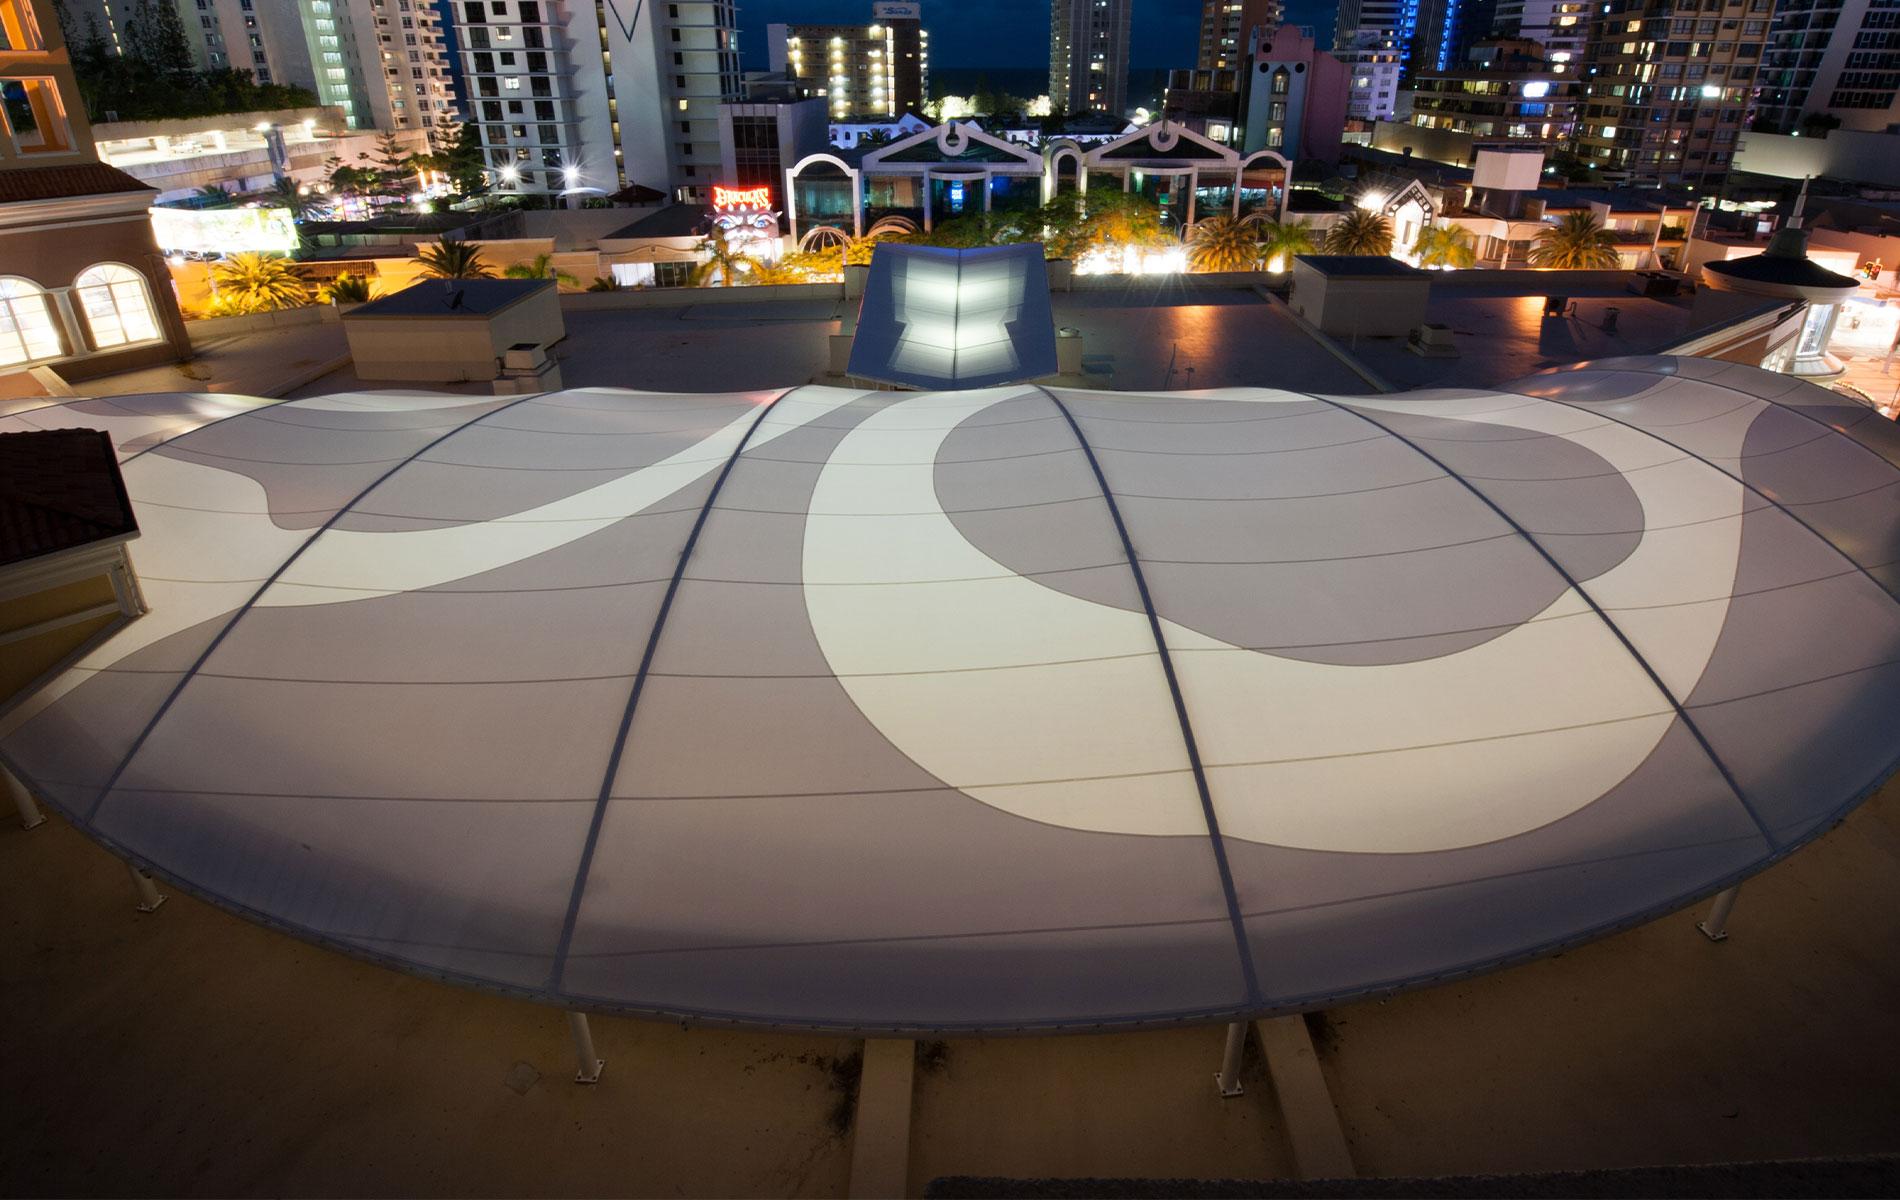 Chevron Renaissance Fabric Roof